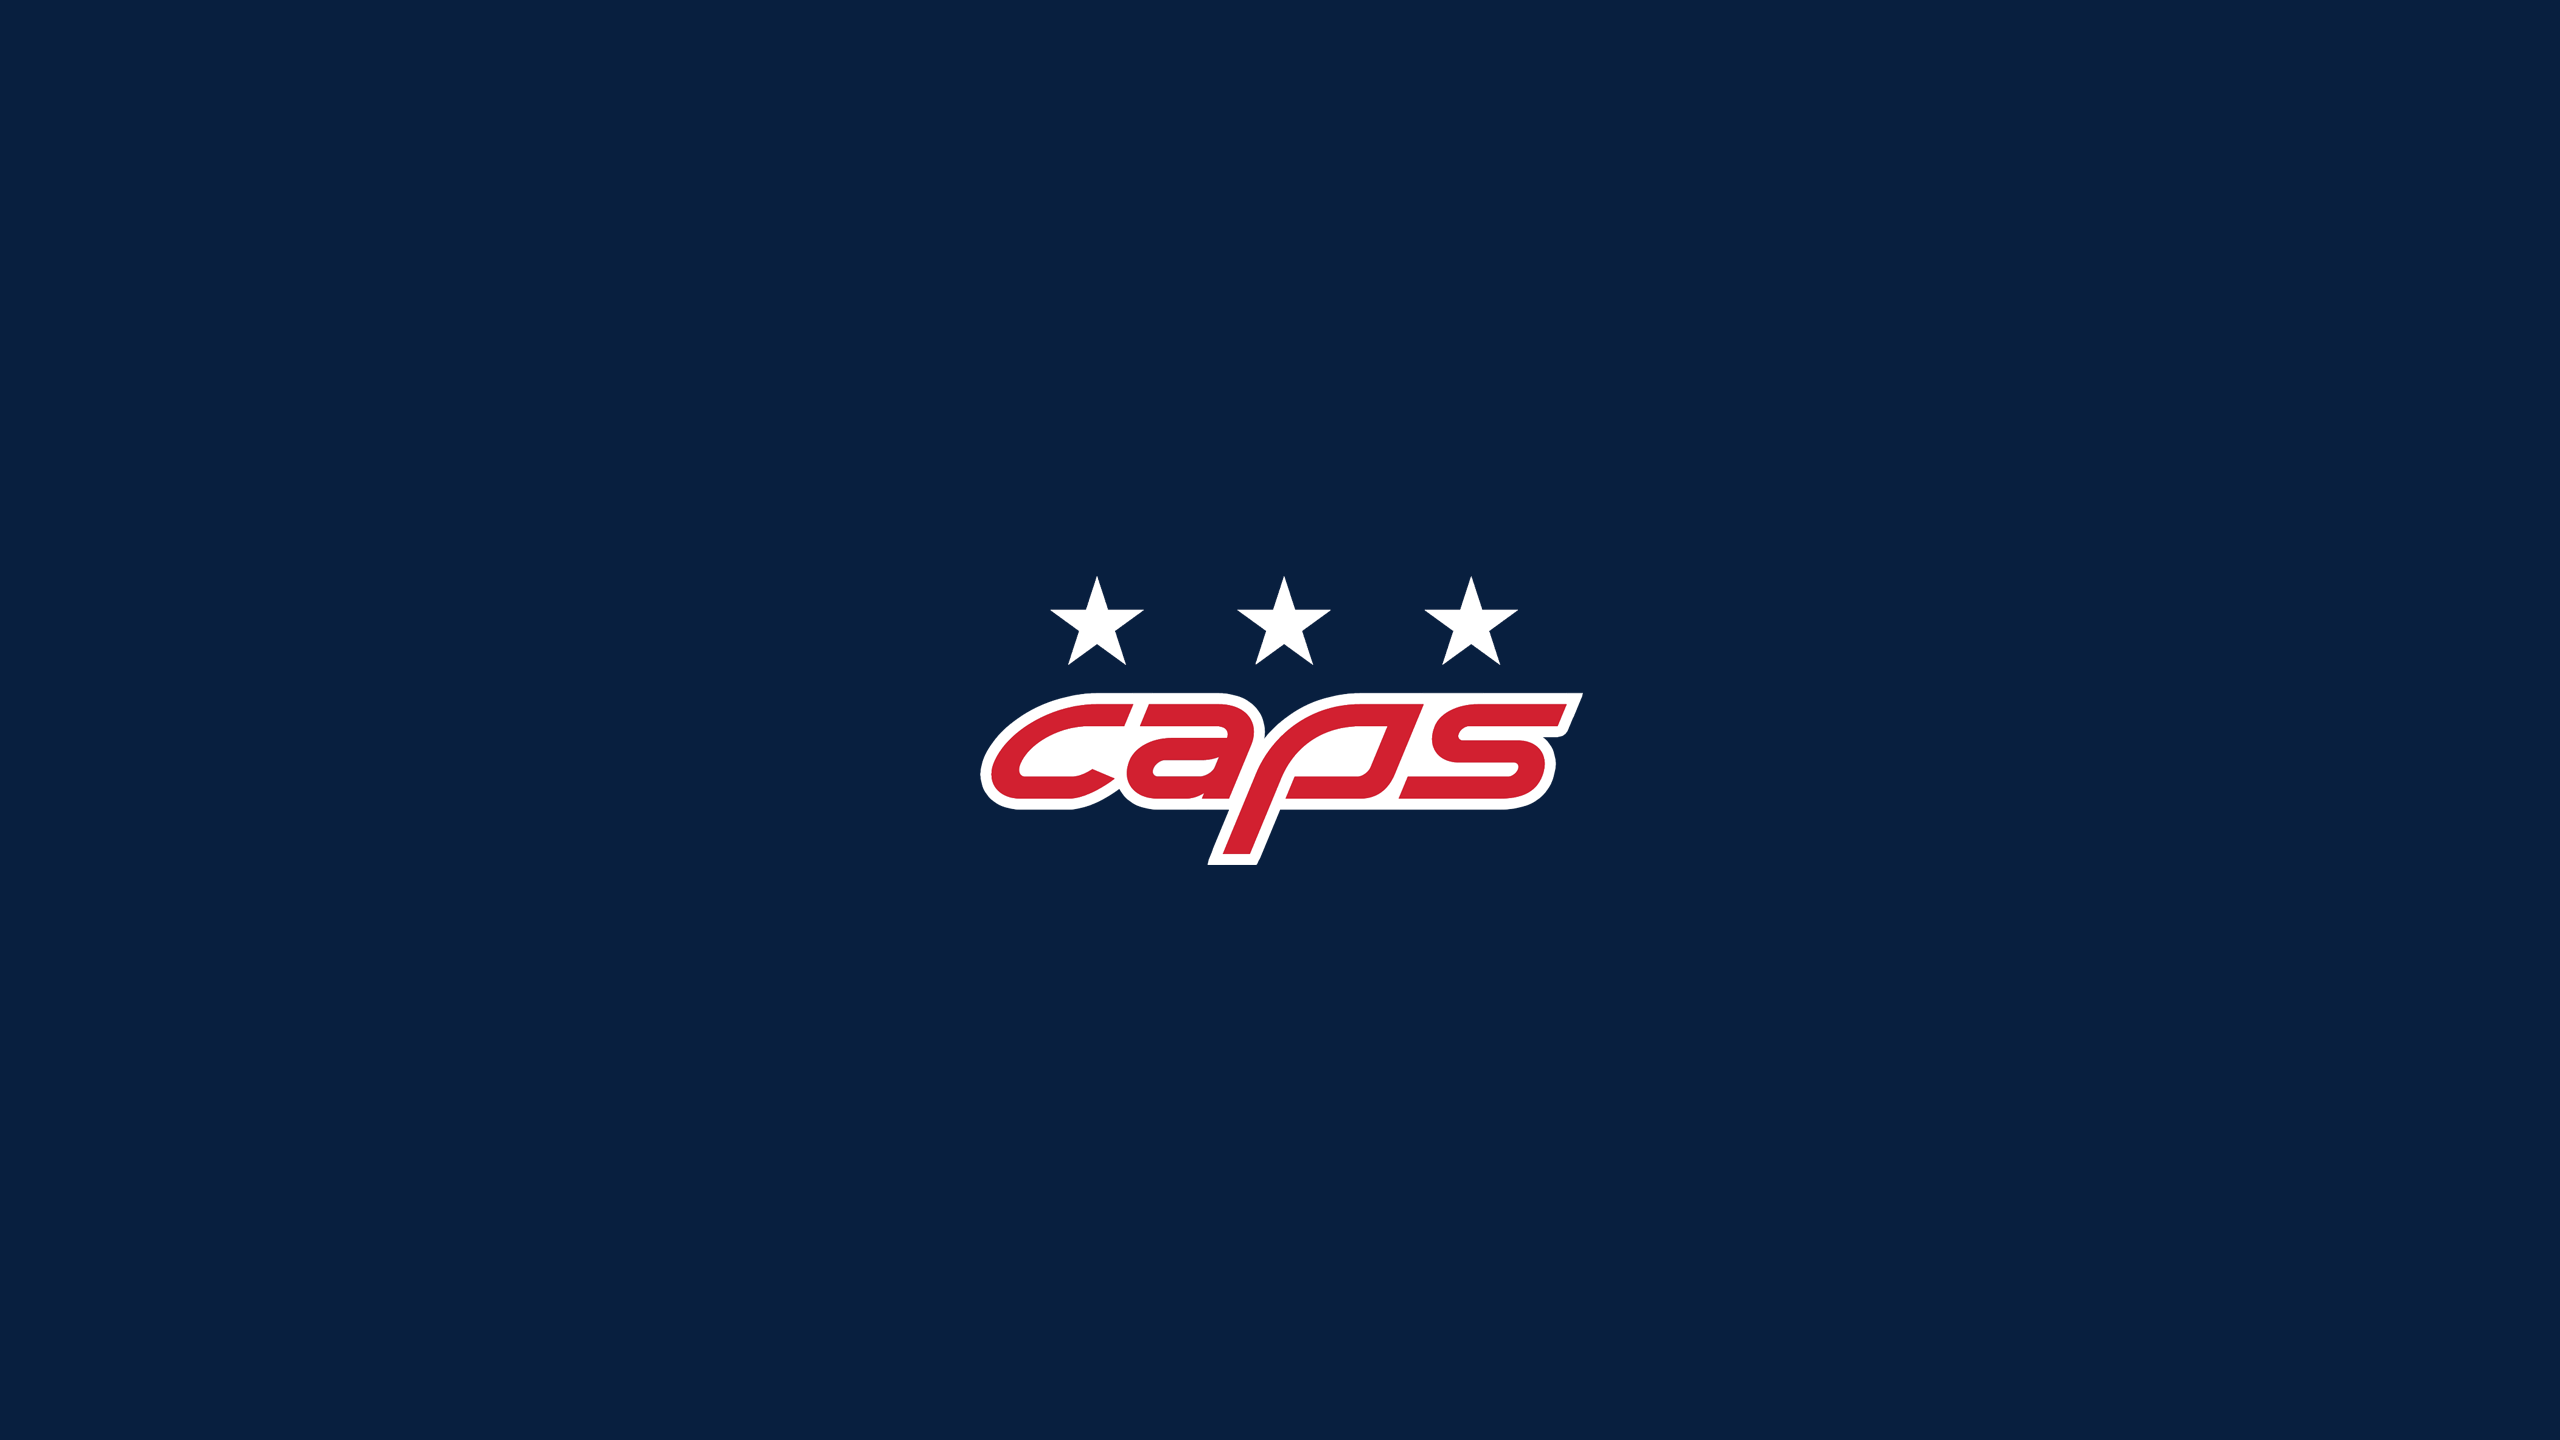 Washington Capitals (Stadium Series)